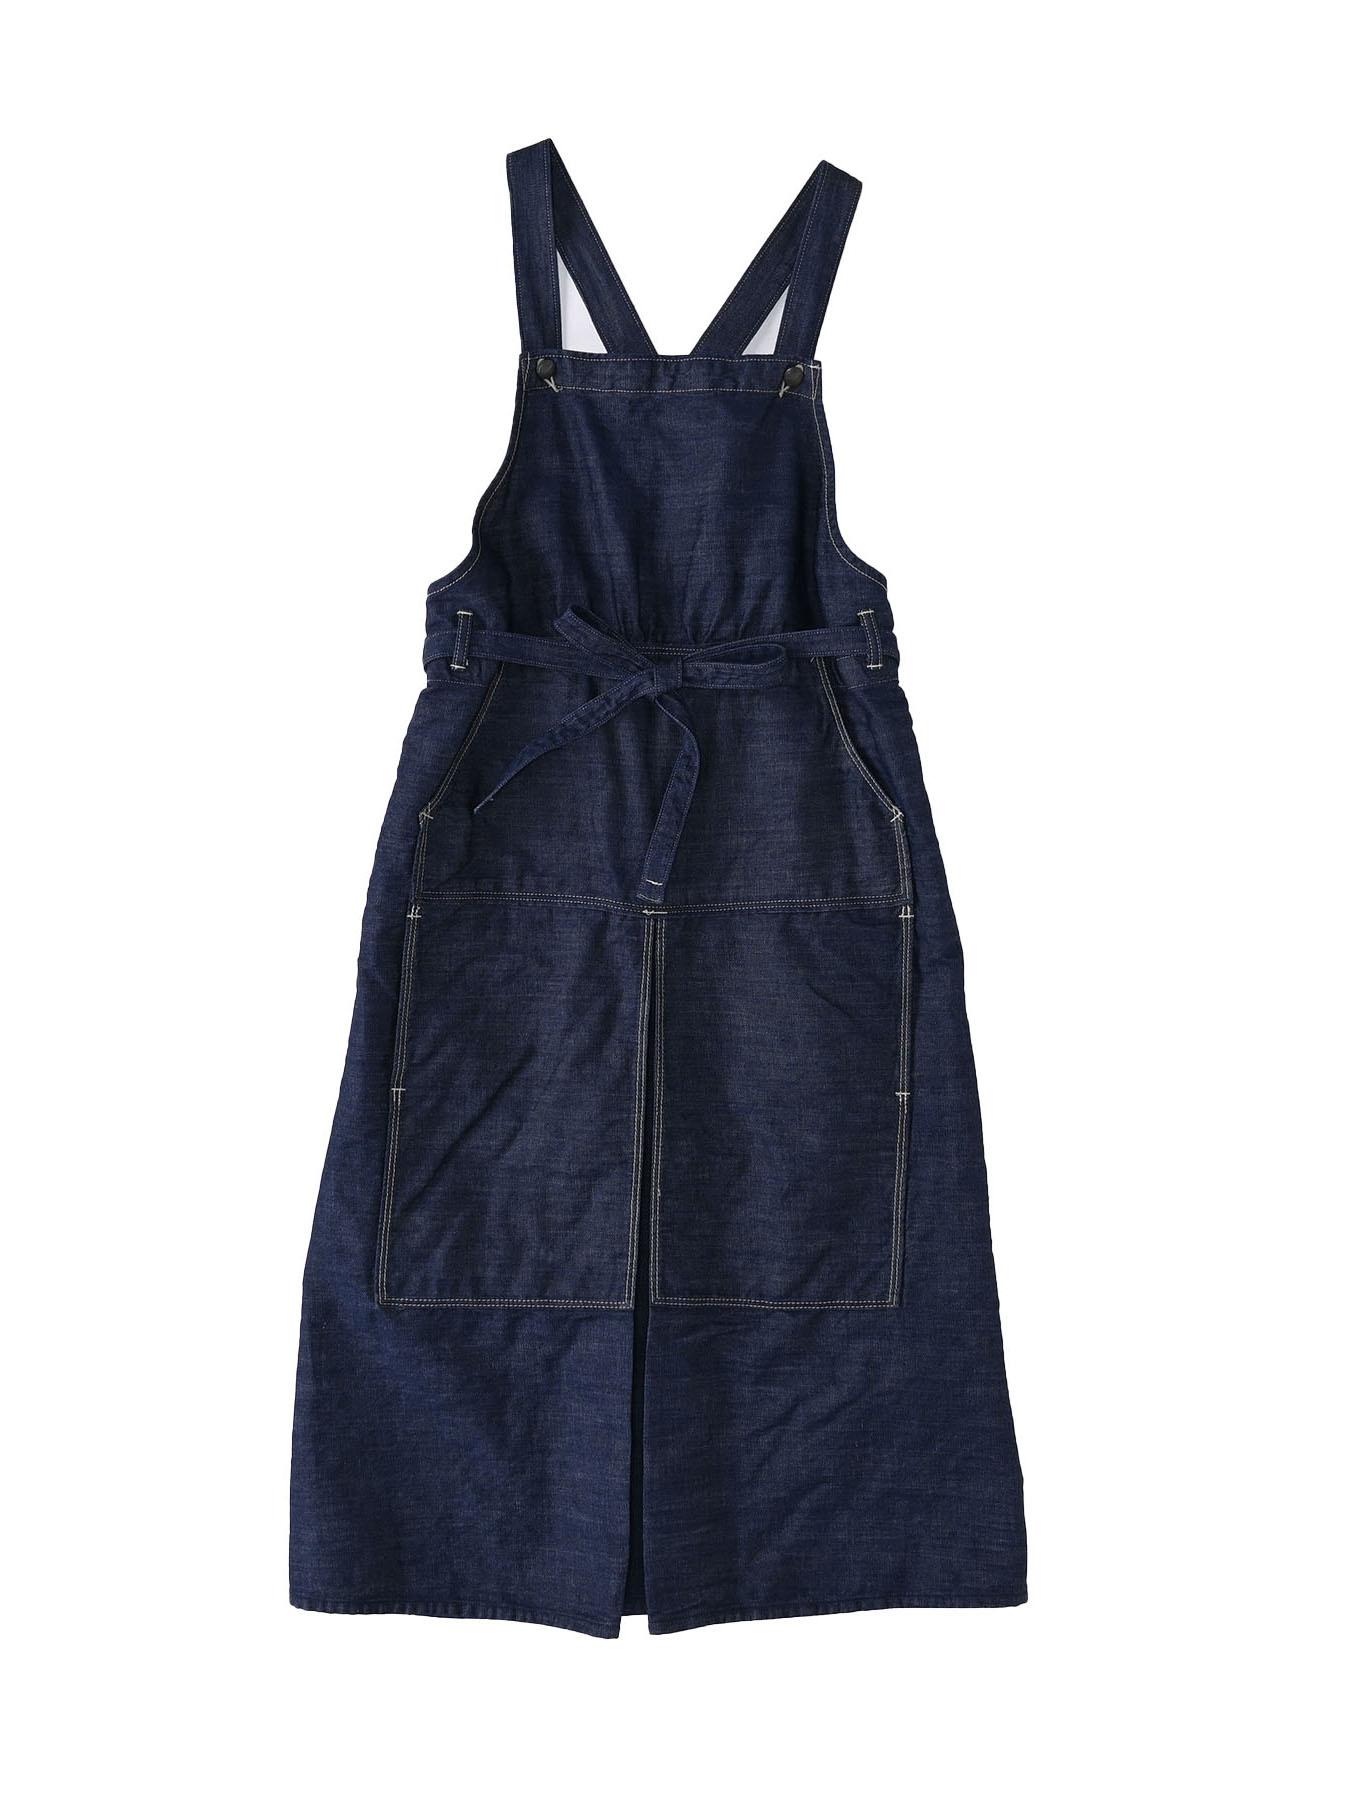 Monpu Apron Dress (0421)-1